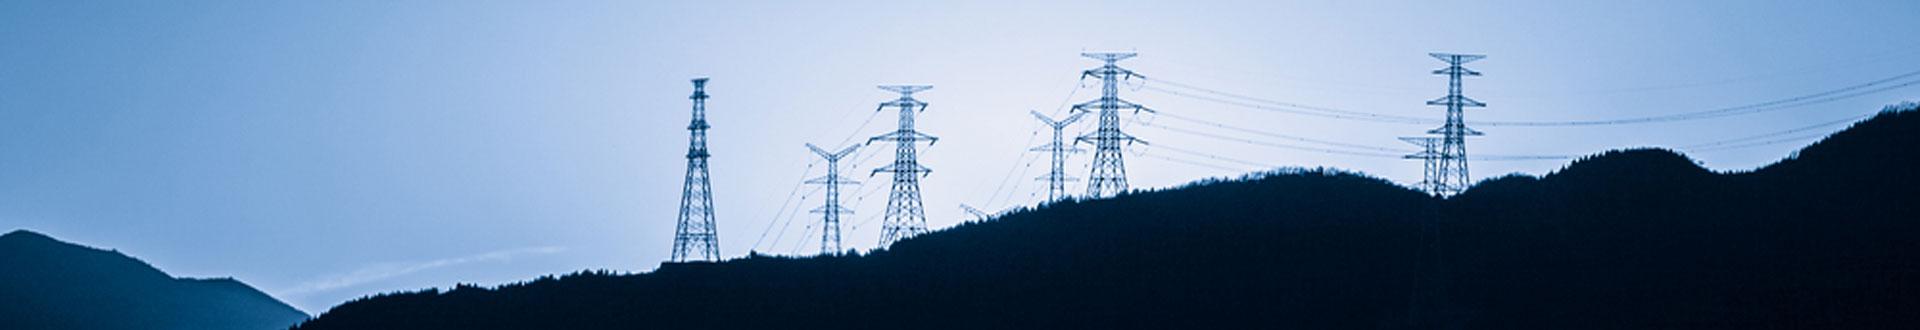 pylons-nerc